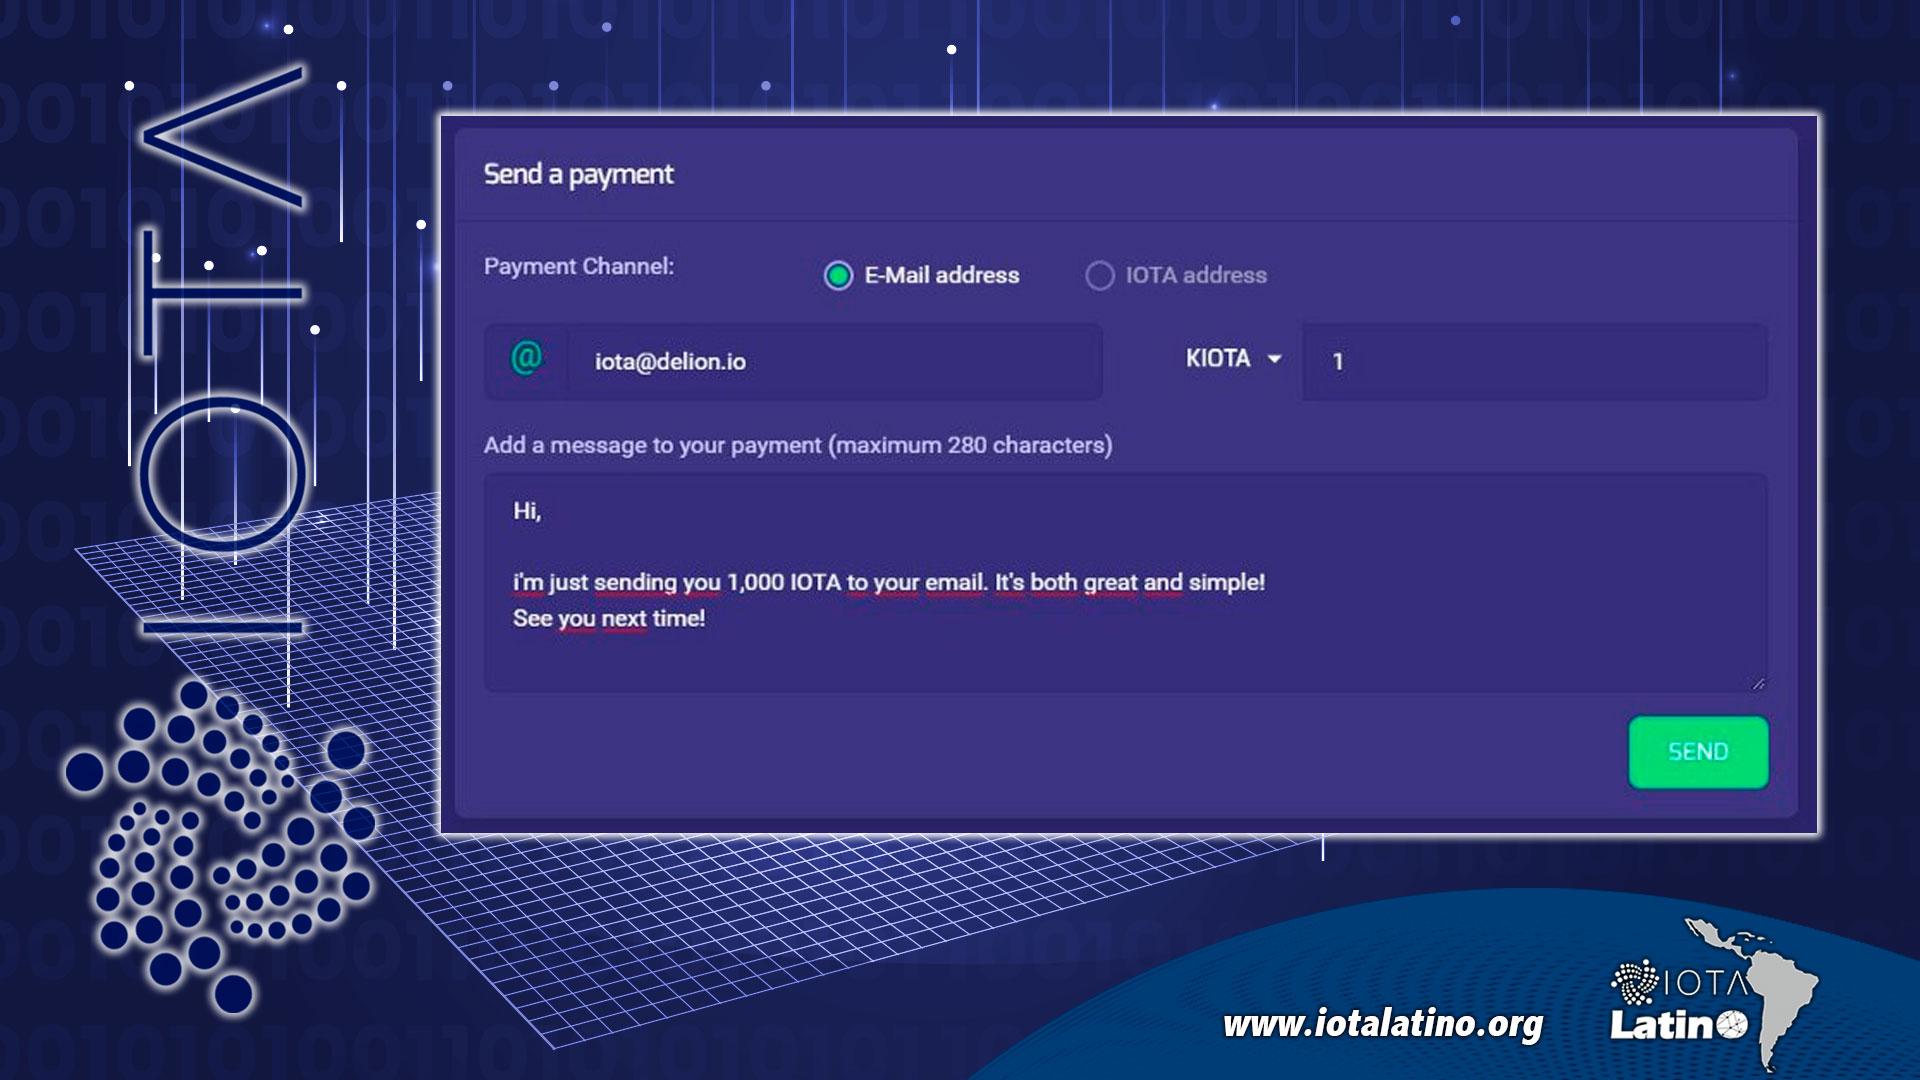 enviar y recibir IOTA - API Delion - 2